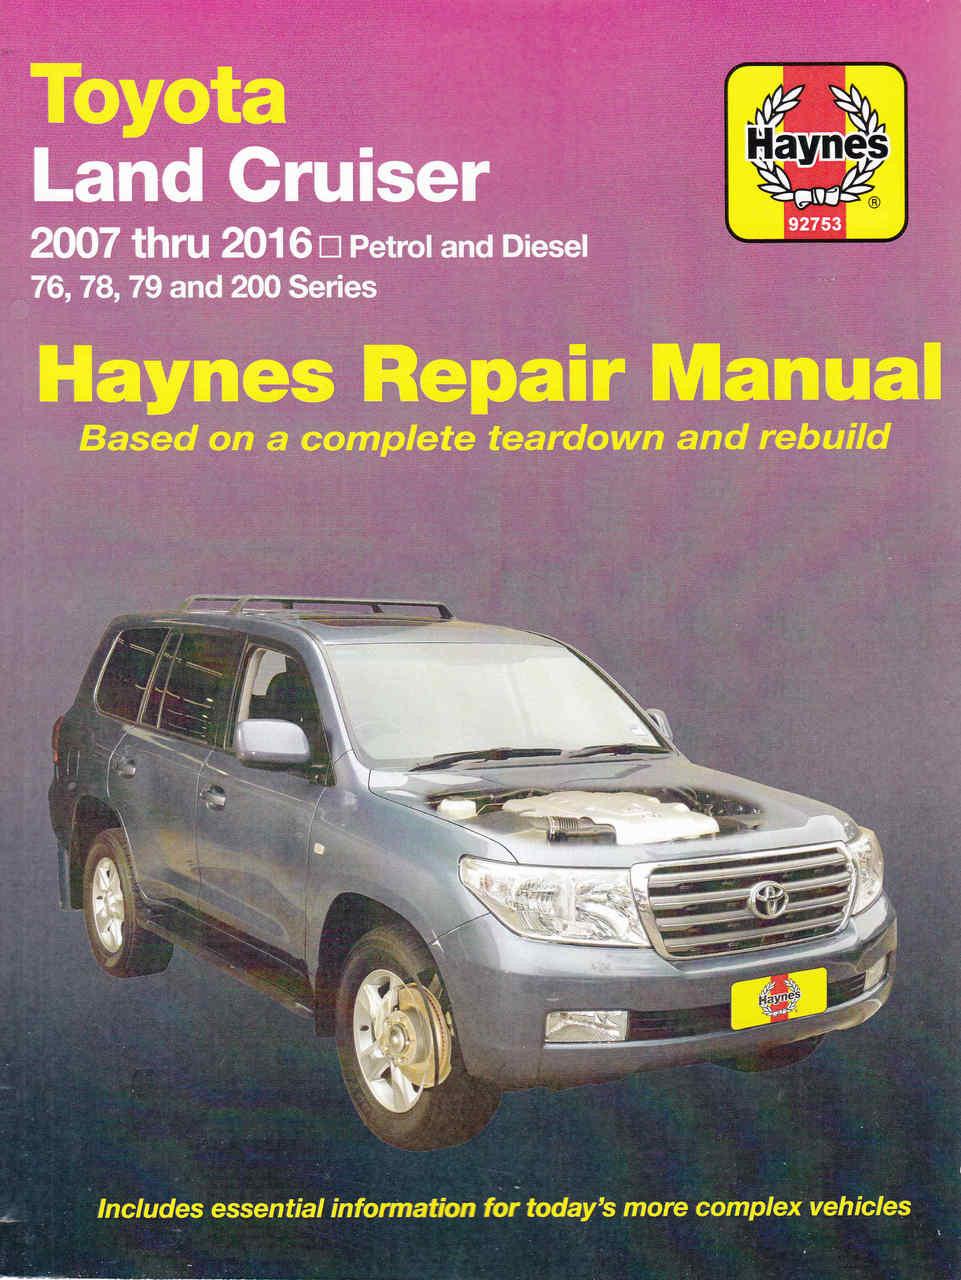 hight resolution of toyota land cruiser 76 78 79 and 200 series petrol diesel 2007 2016 workshop manual